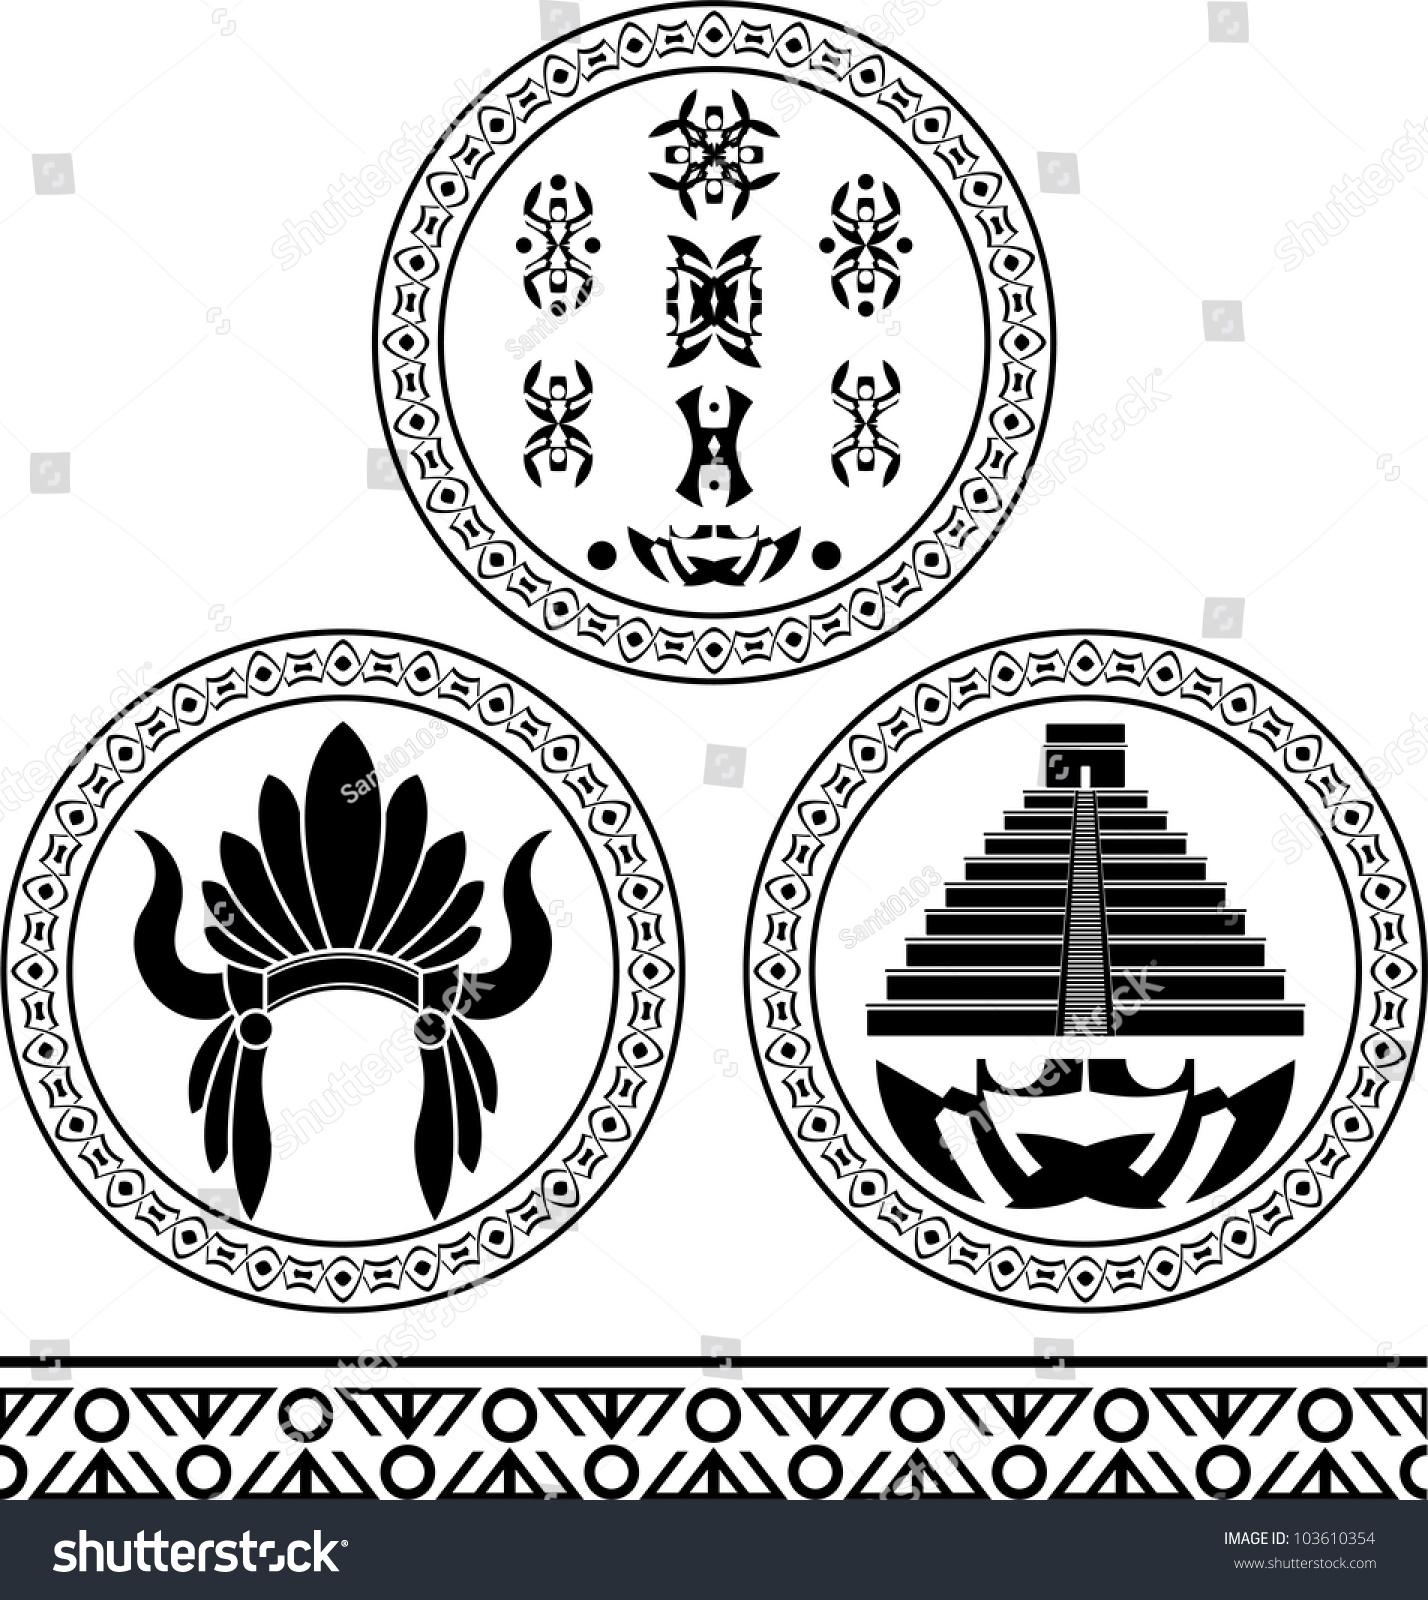 Mayan Signs Headdress Pyramid Pattern Stencils Stock Vector